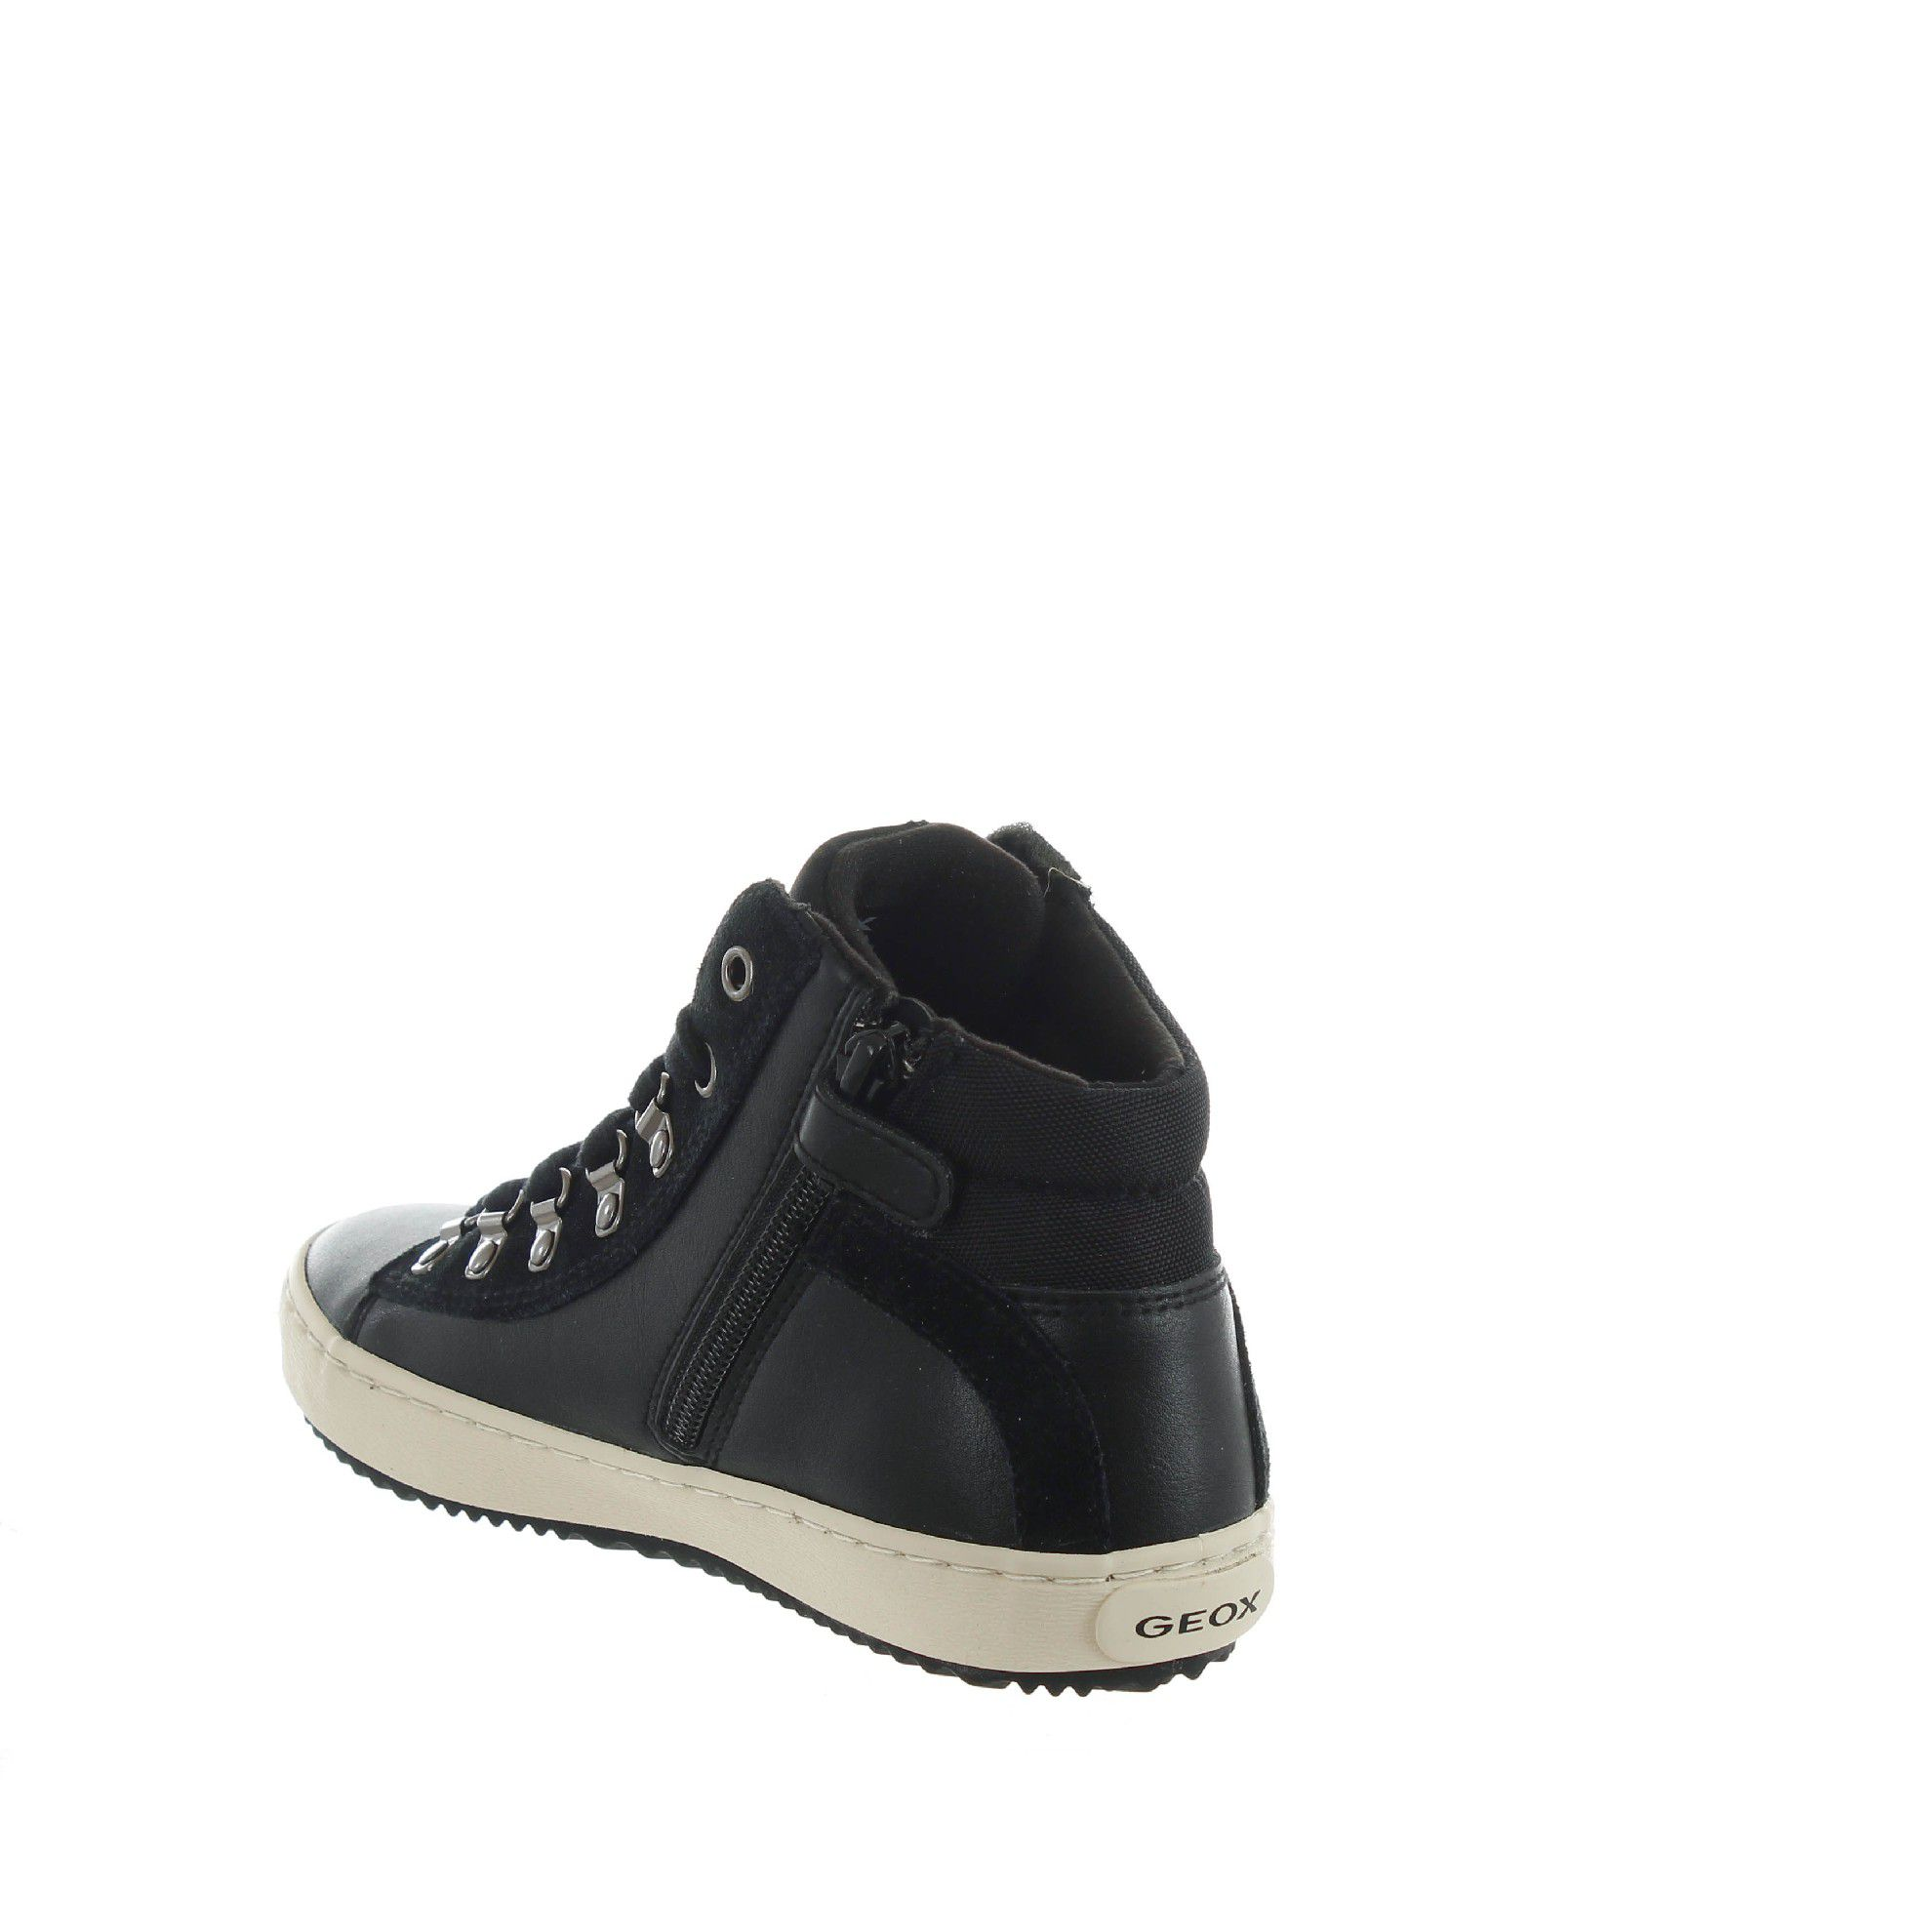 Geox sneaker kalispera in pelle trapuntata da bambina